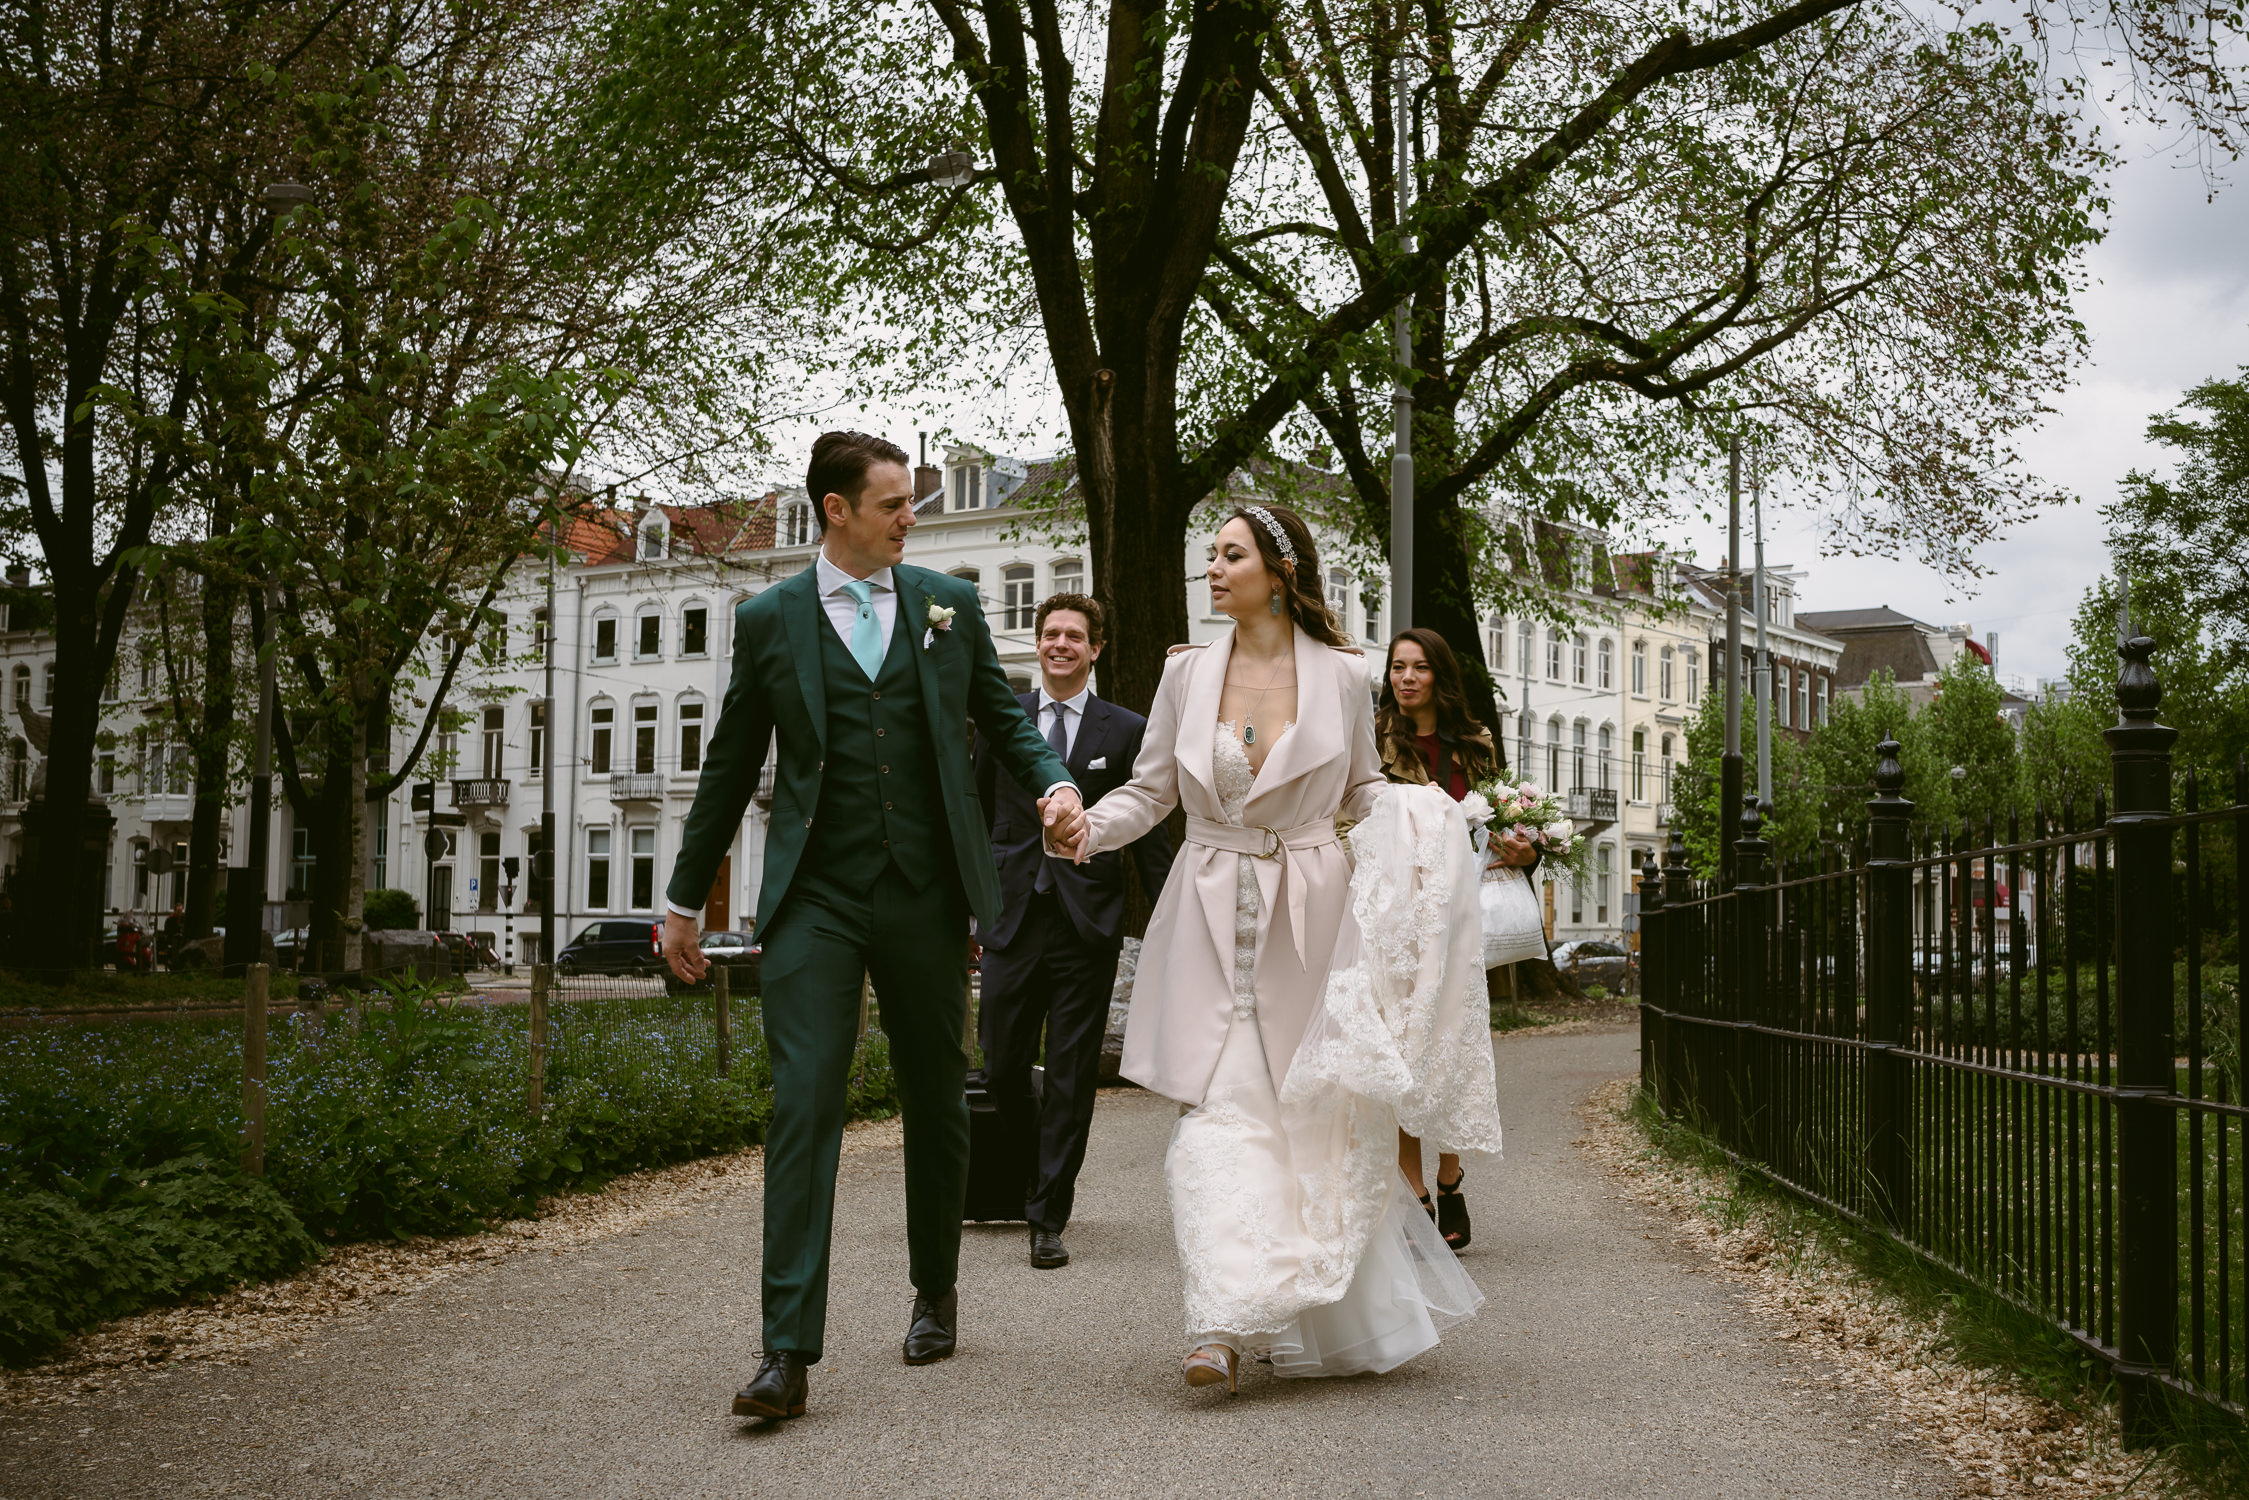 bruidsfotografie-amsterdam-utrecht-trouwfotograaf-mark-hadden-wedding-photography-Robin & Guus-021.jpg